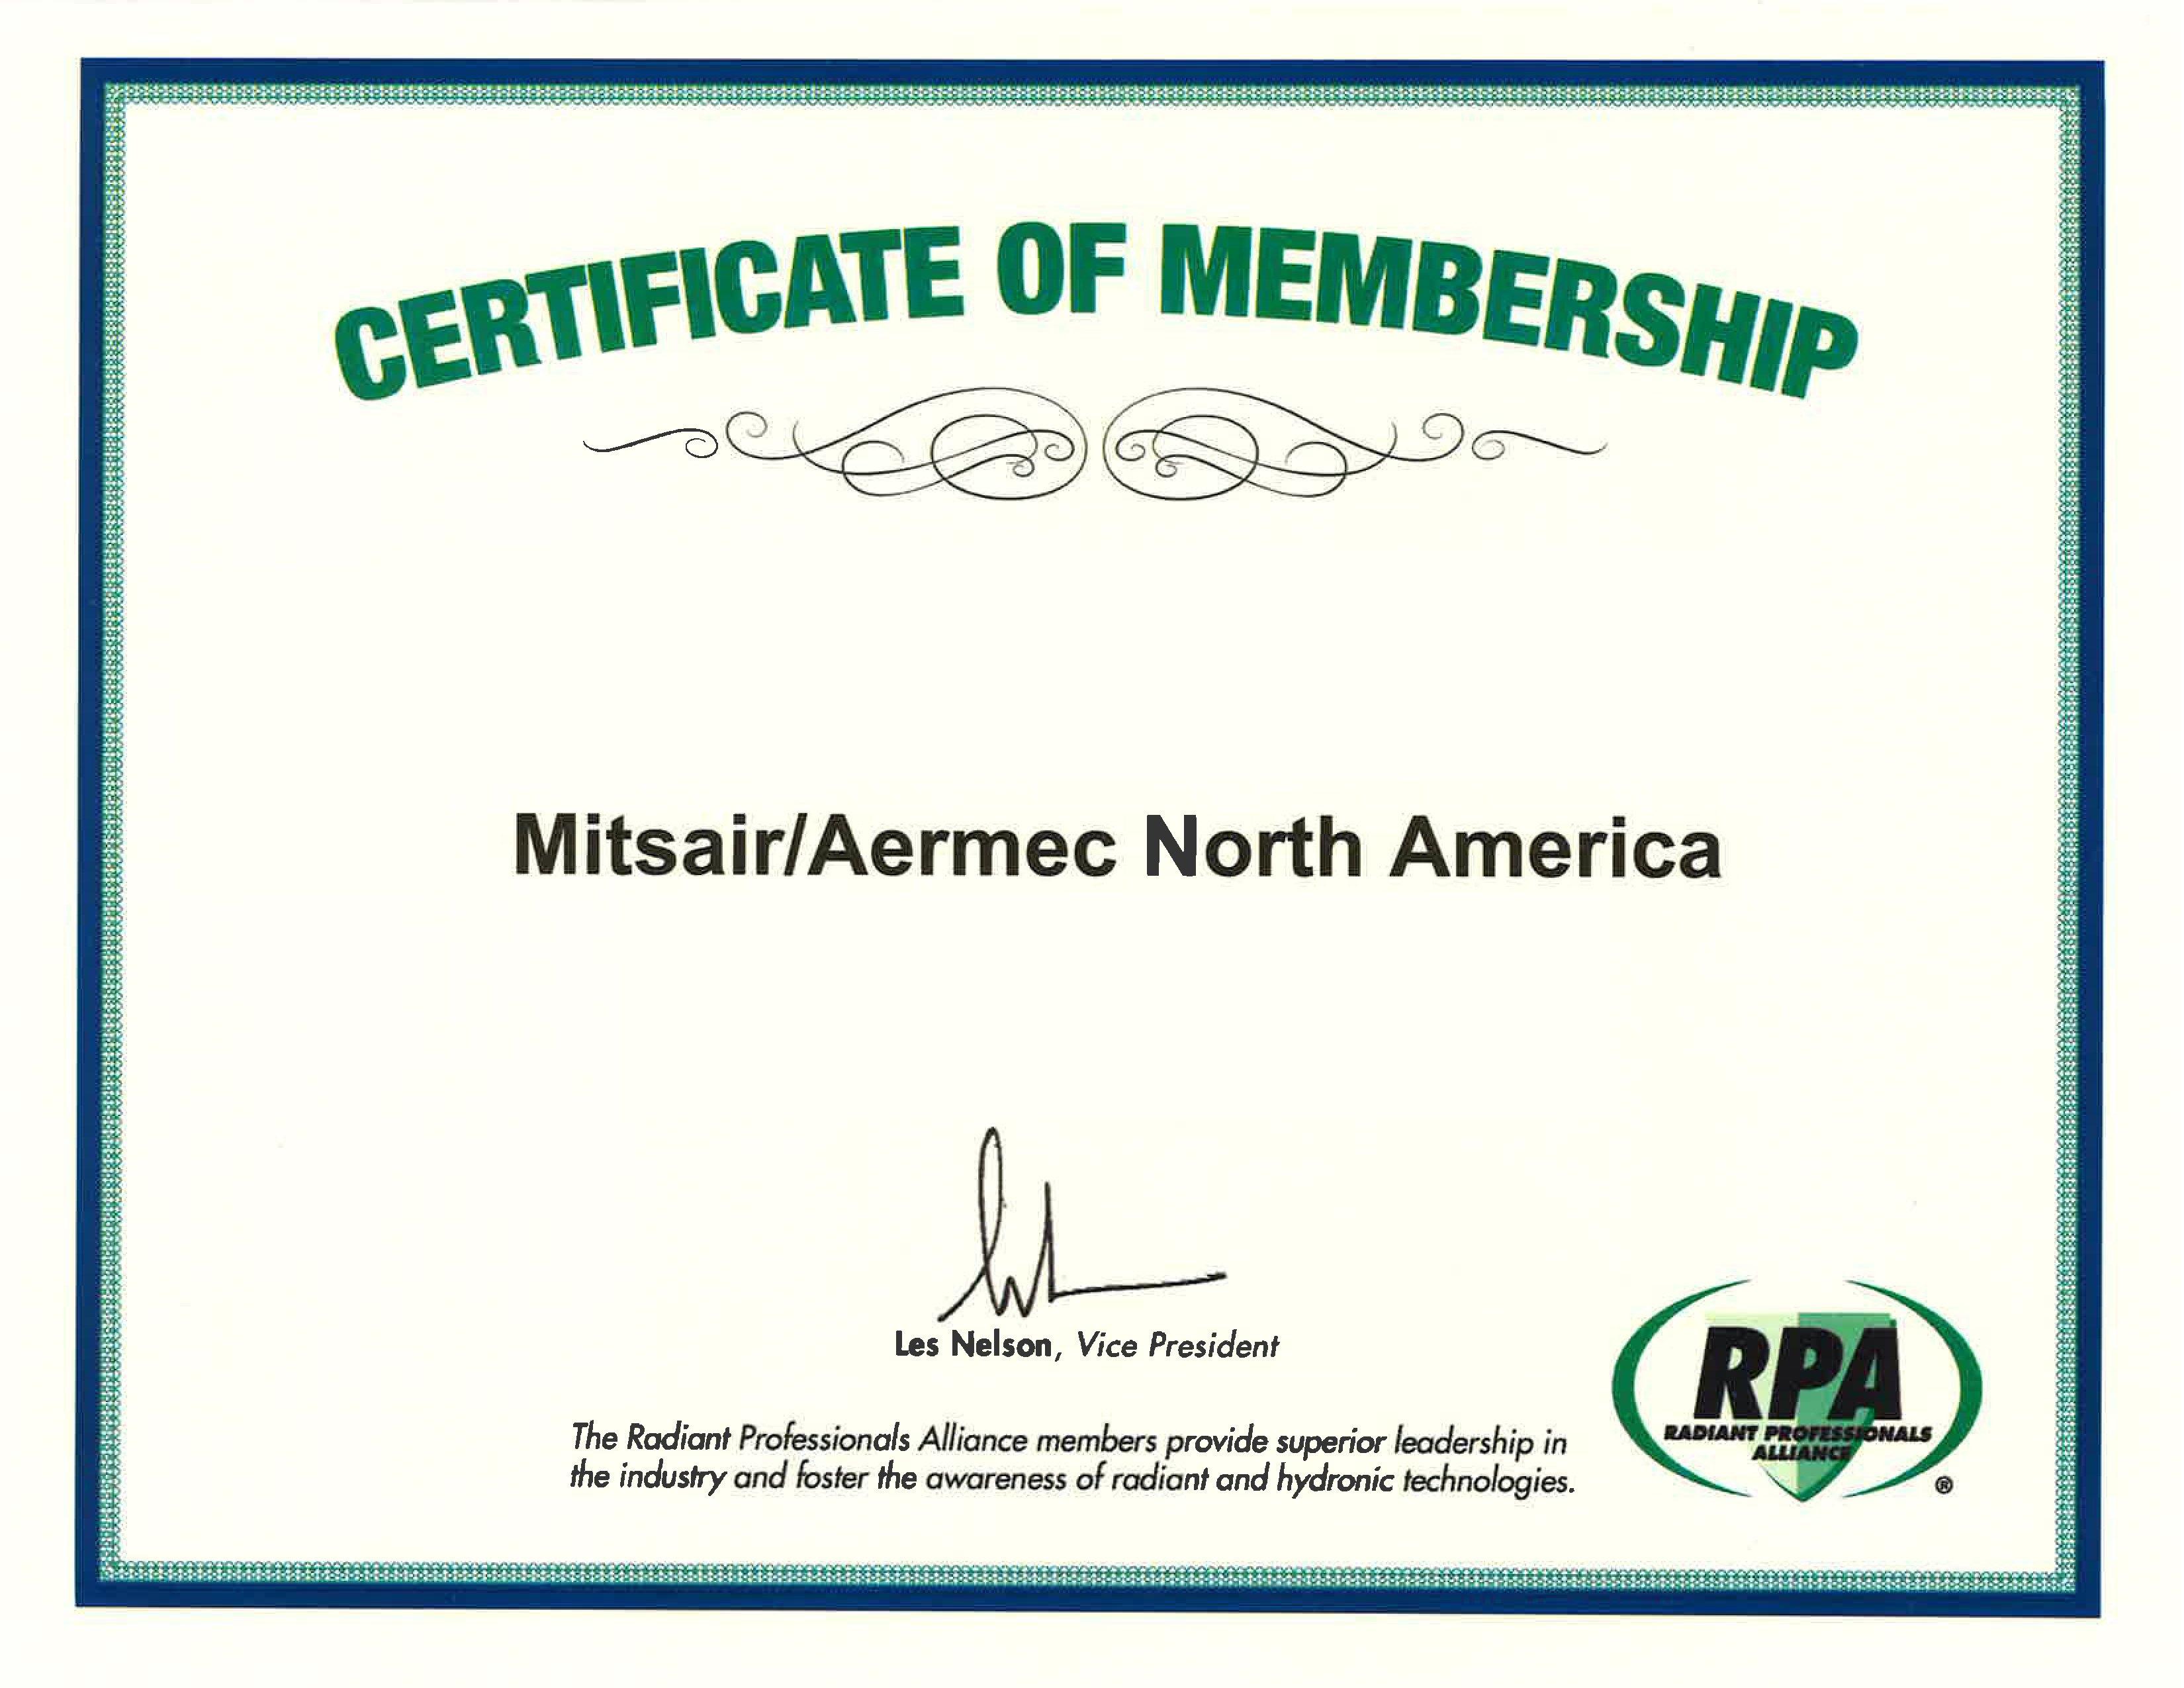 Certificate of Membership RPA.jpg